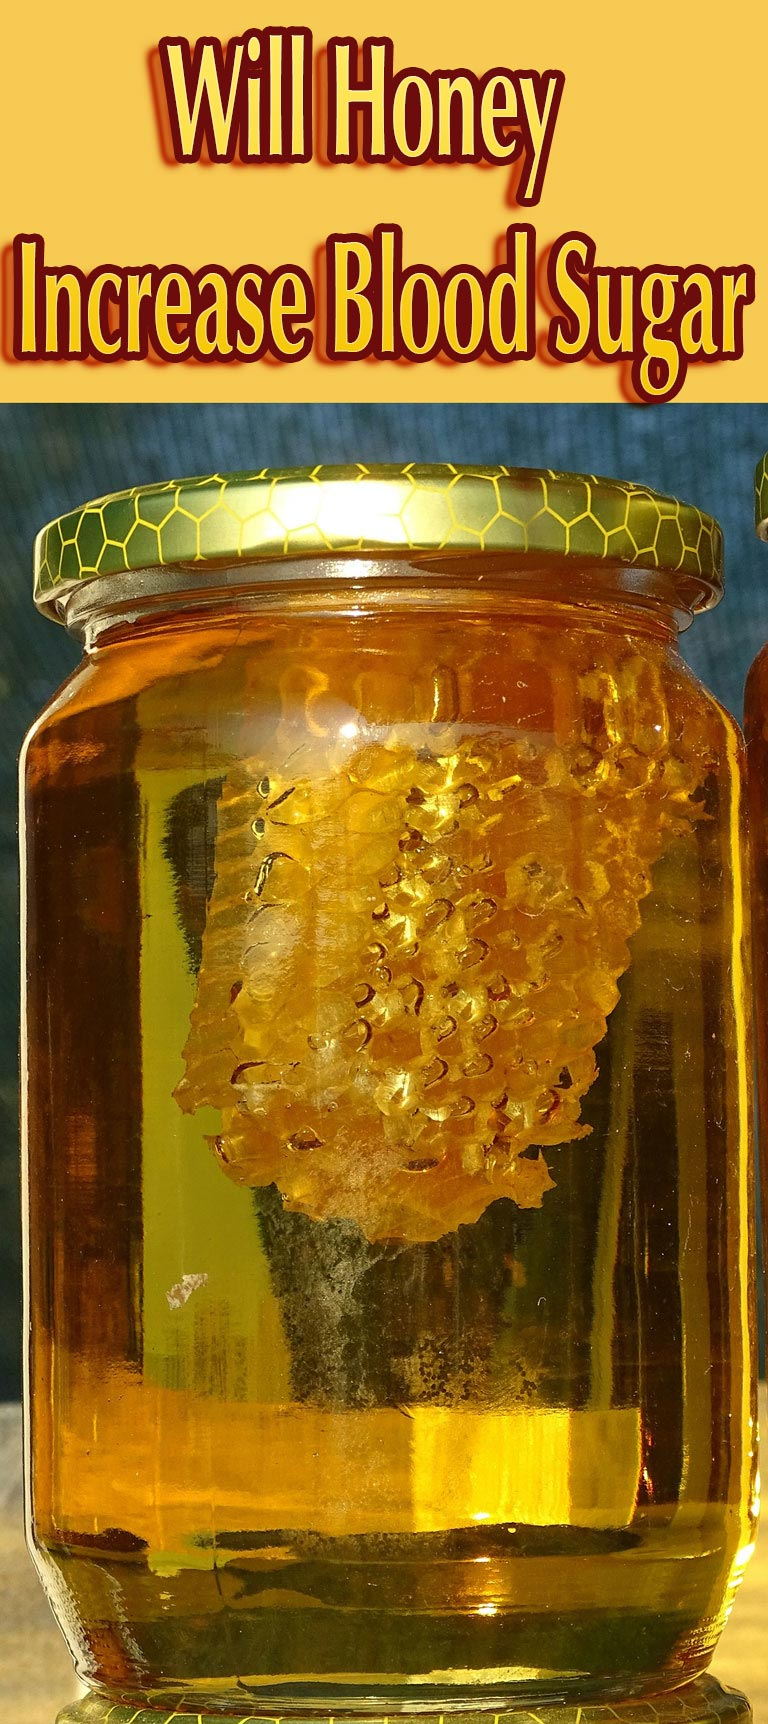 Will Honey Increase Blood Sugar